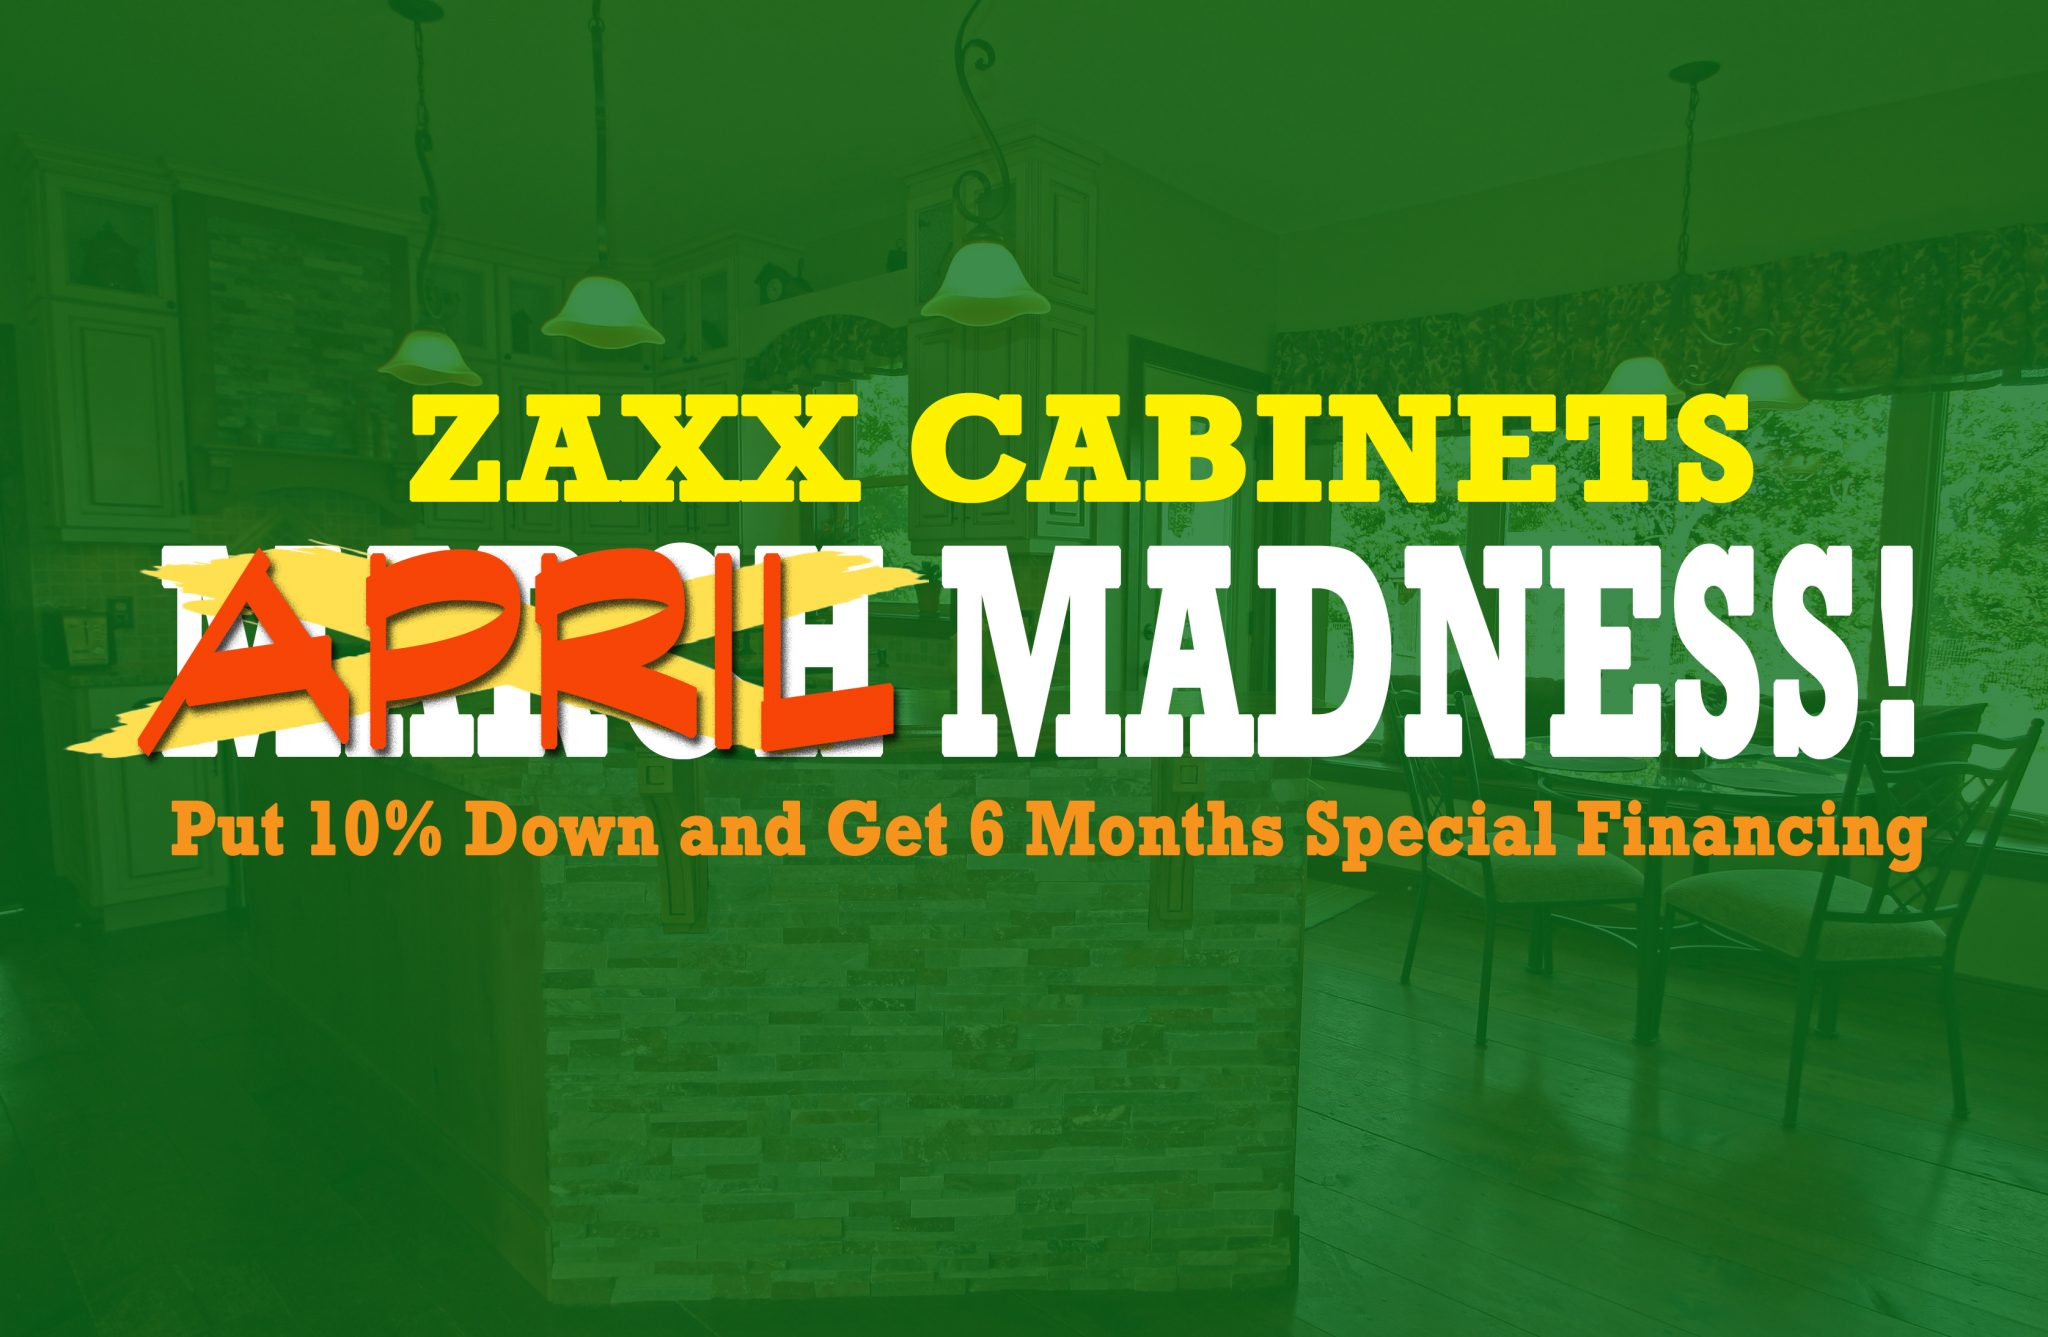 ZAXX Cabinets